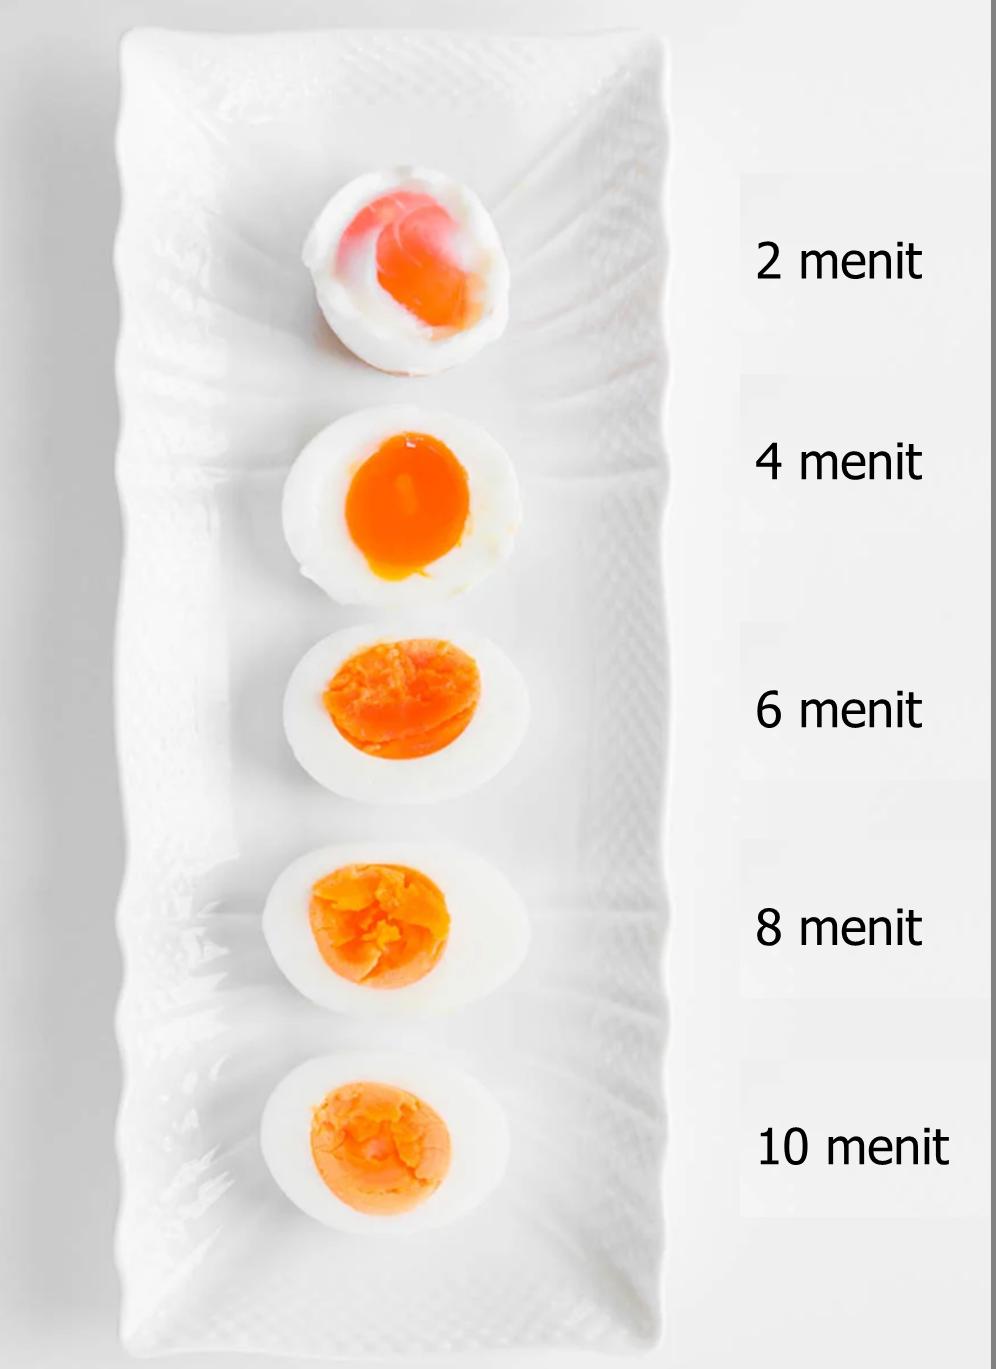 Berapa lama waktu merebus telur hingga matang? - Quora